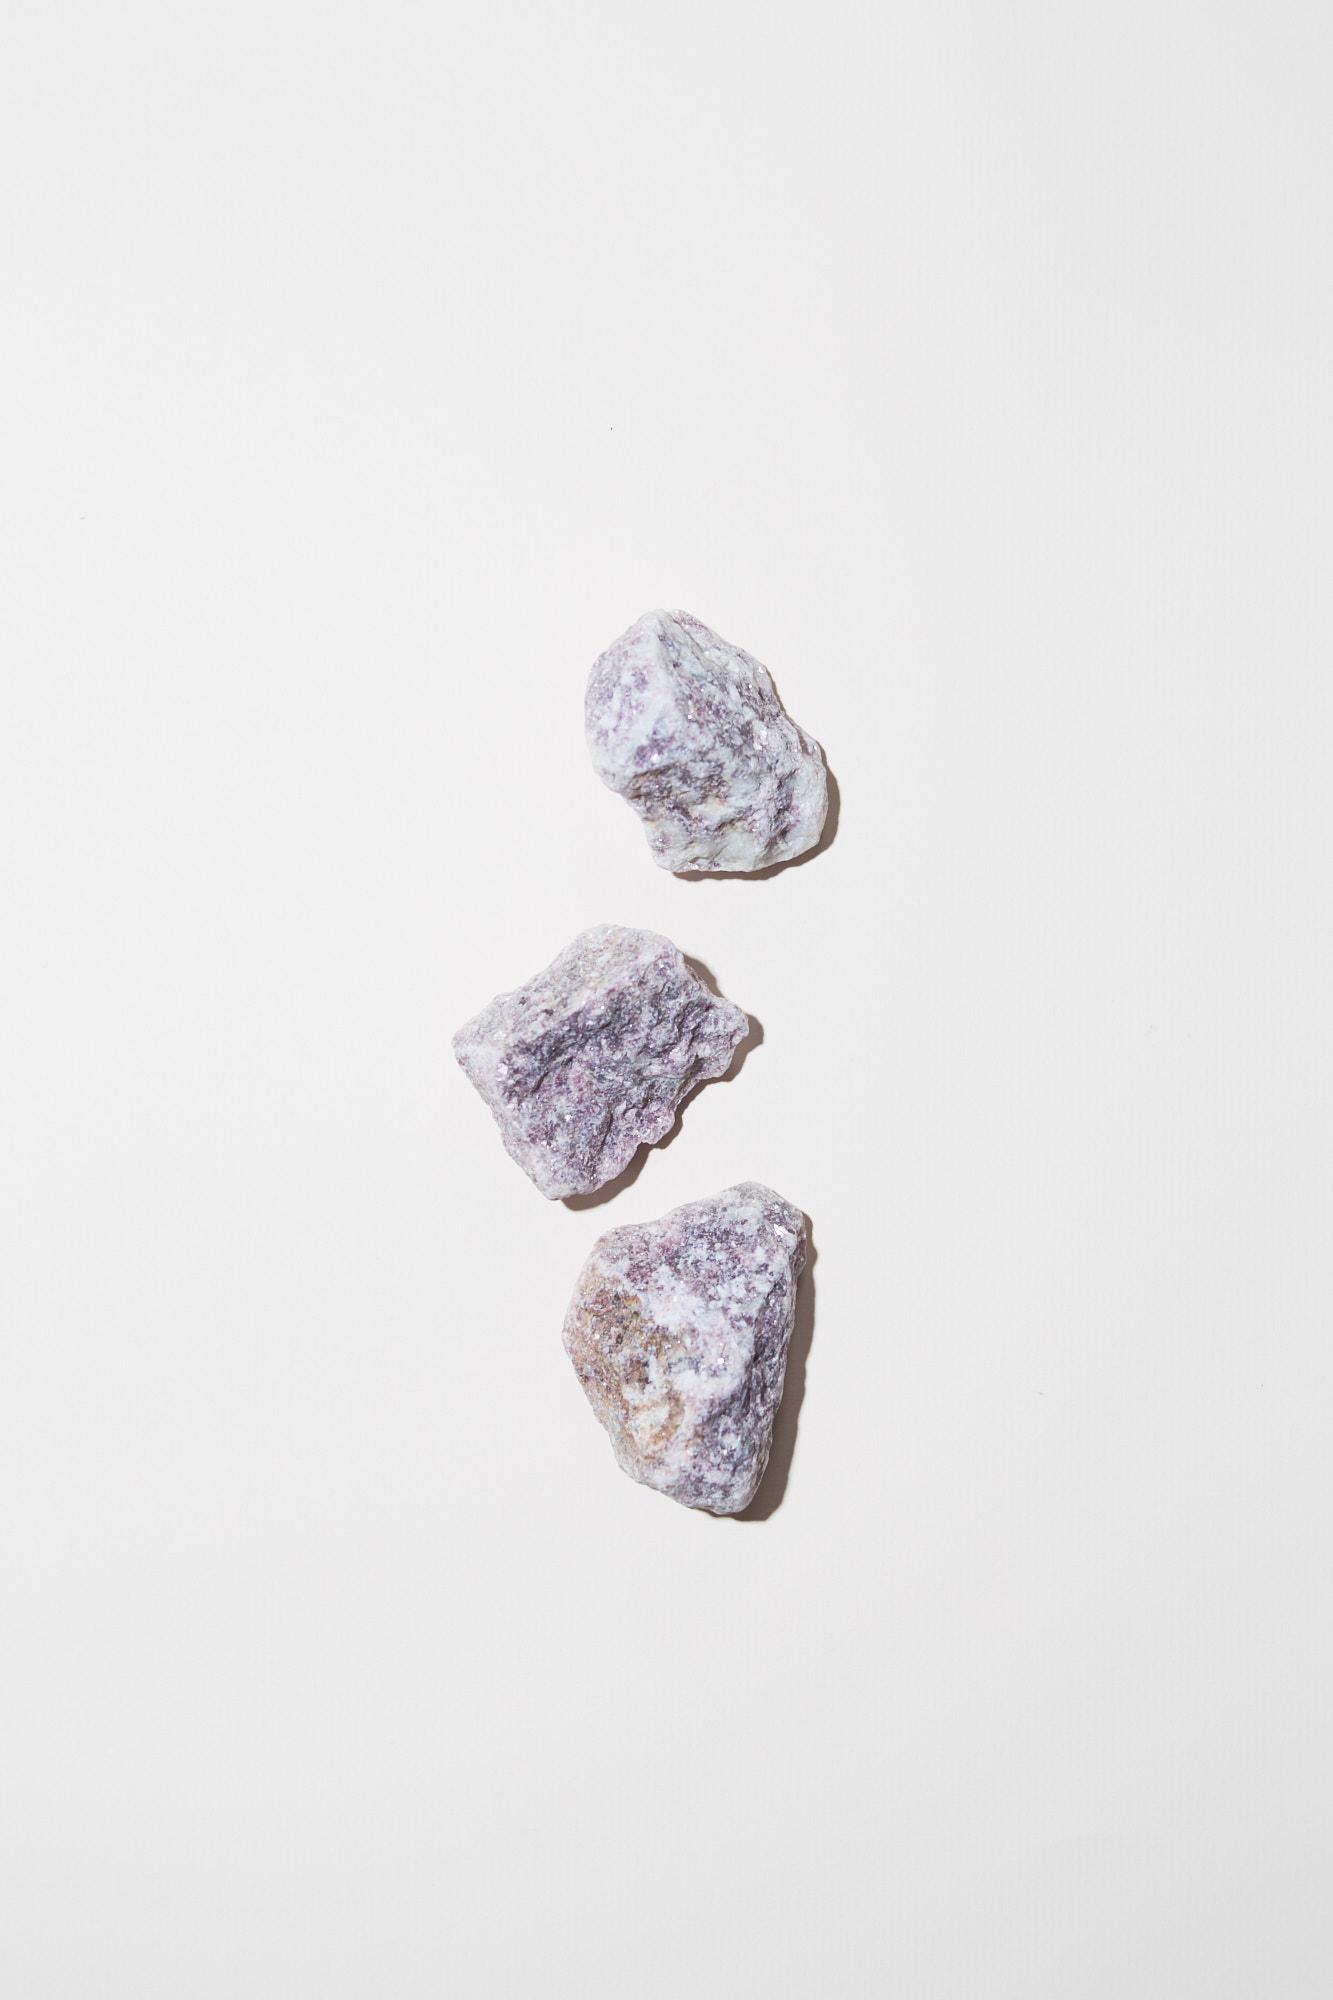 SMCLEOD_20170908_Crystals_054